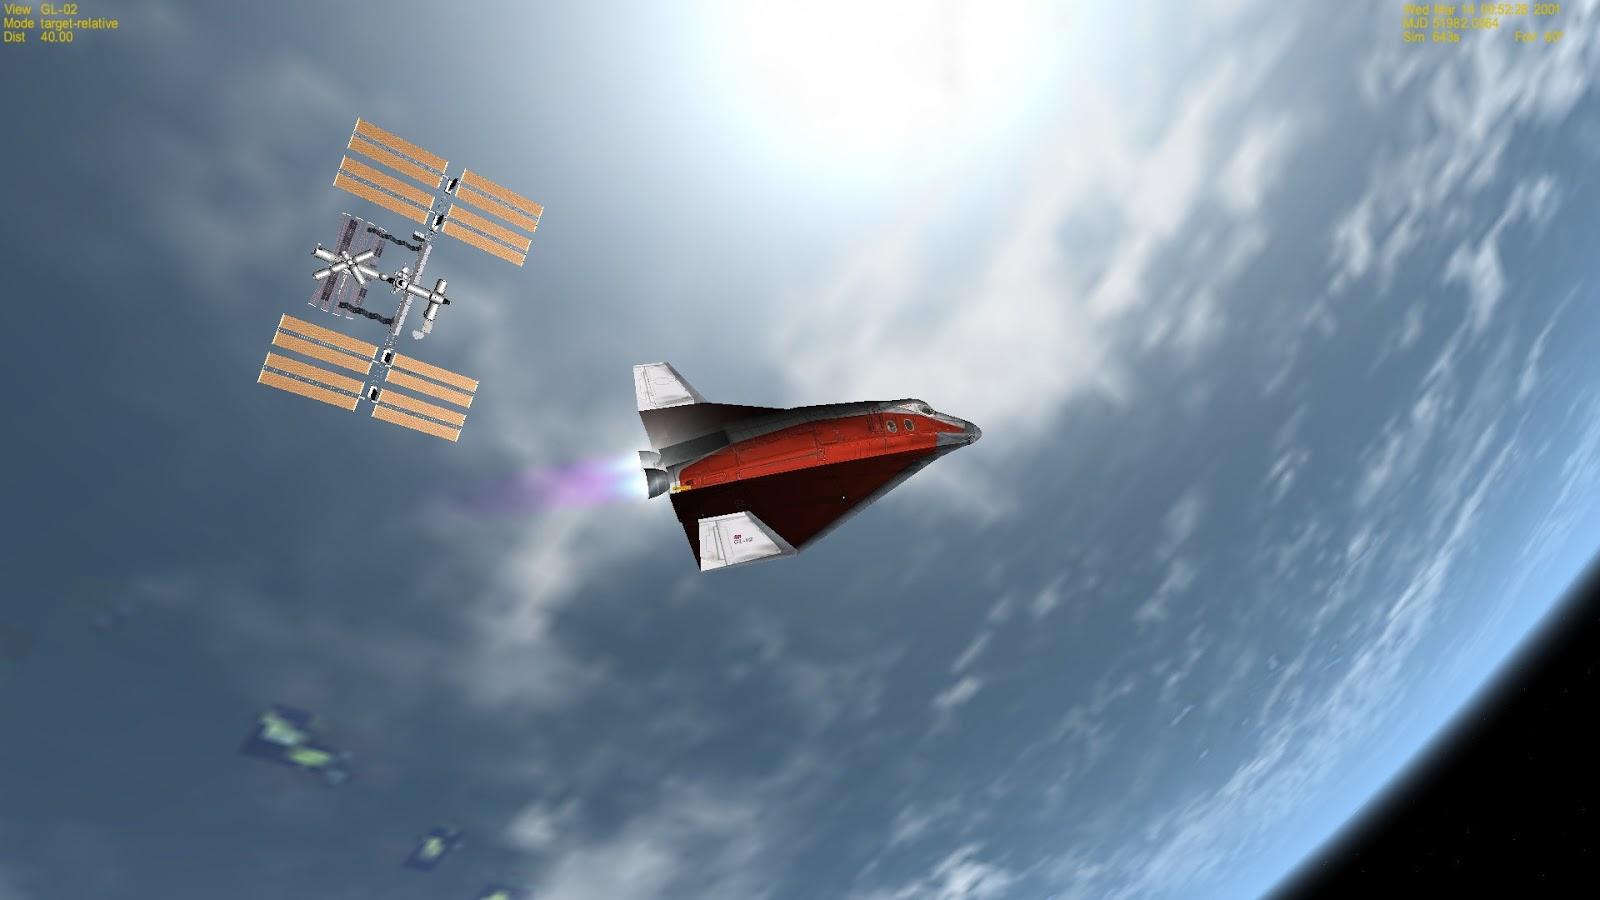 orbiter space flight simulator - photo #21